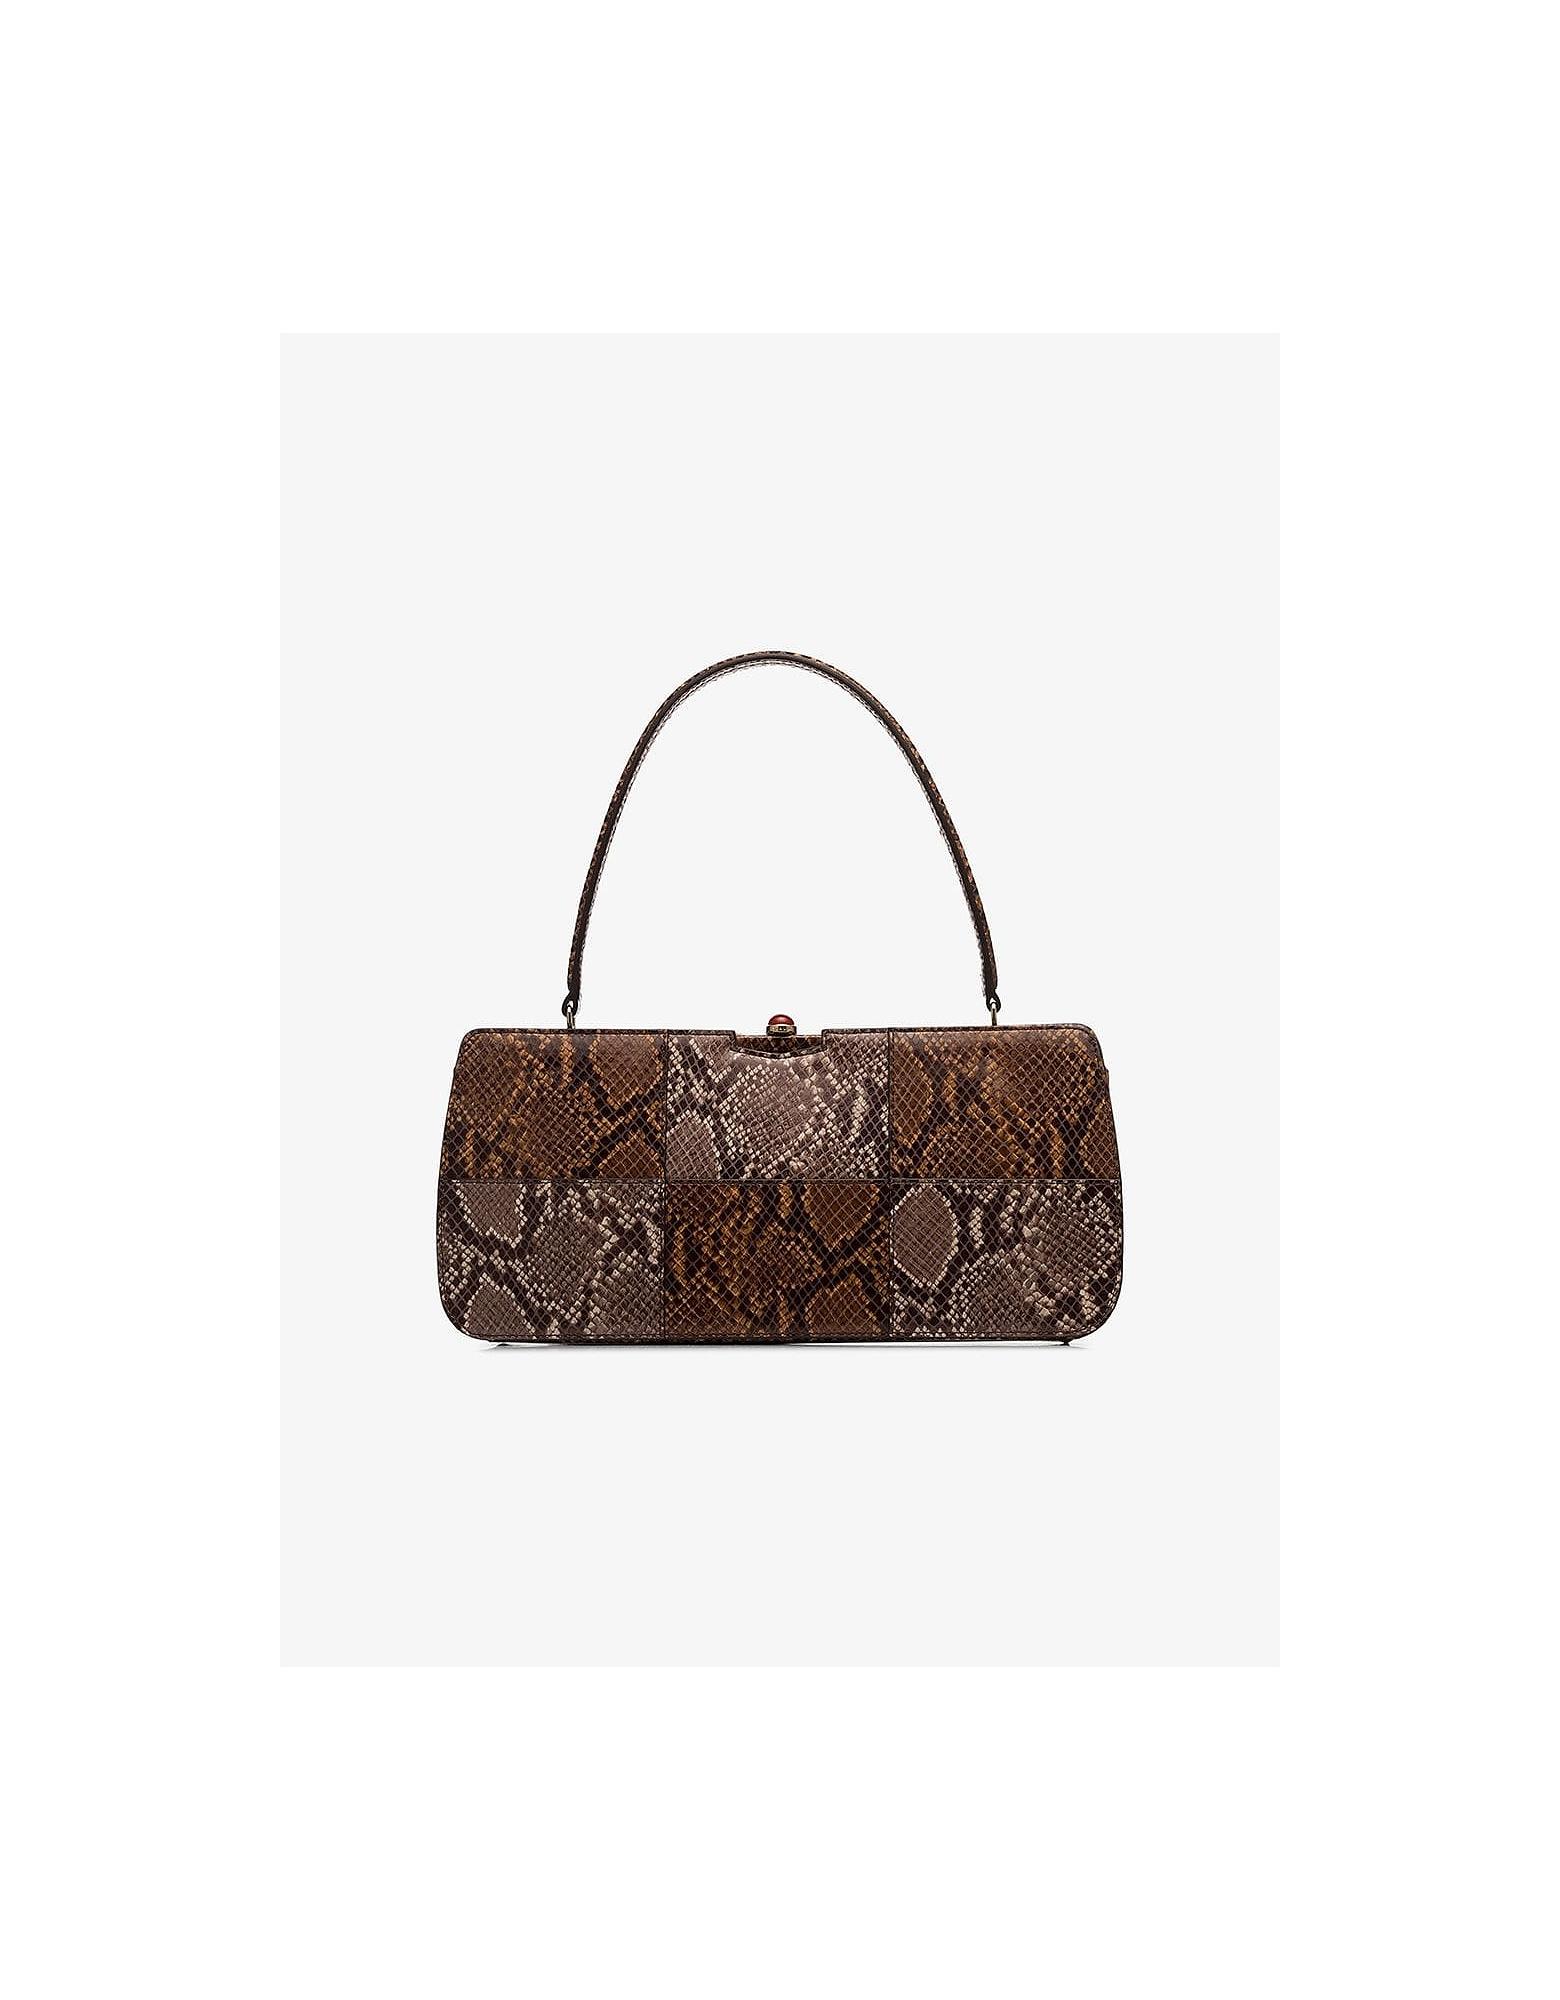 Staud Designer Handbags, Brown Whitney Snake Leather Shoulder Bag